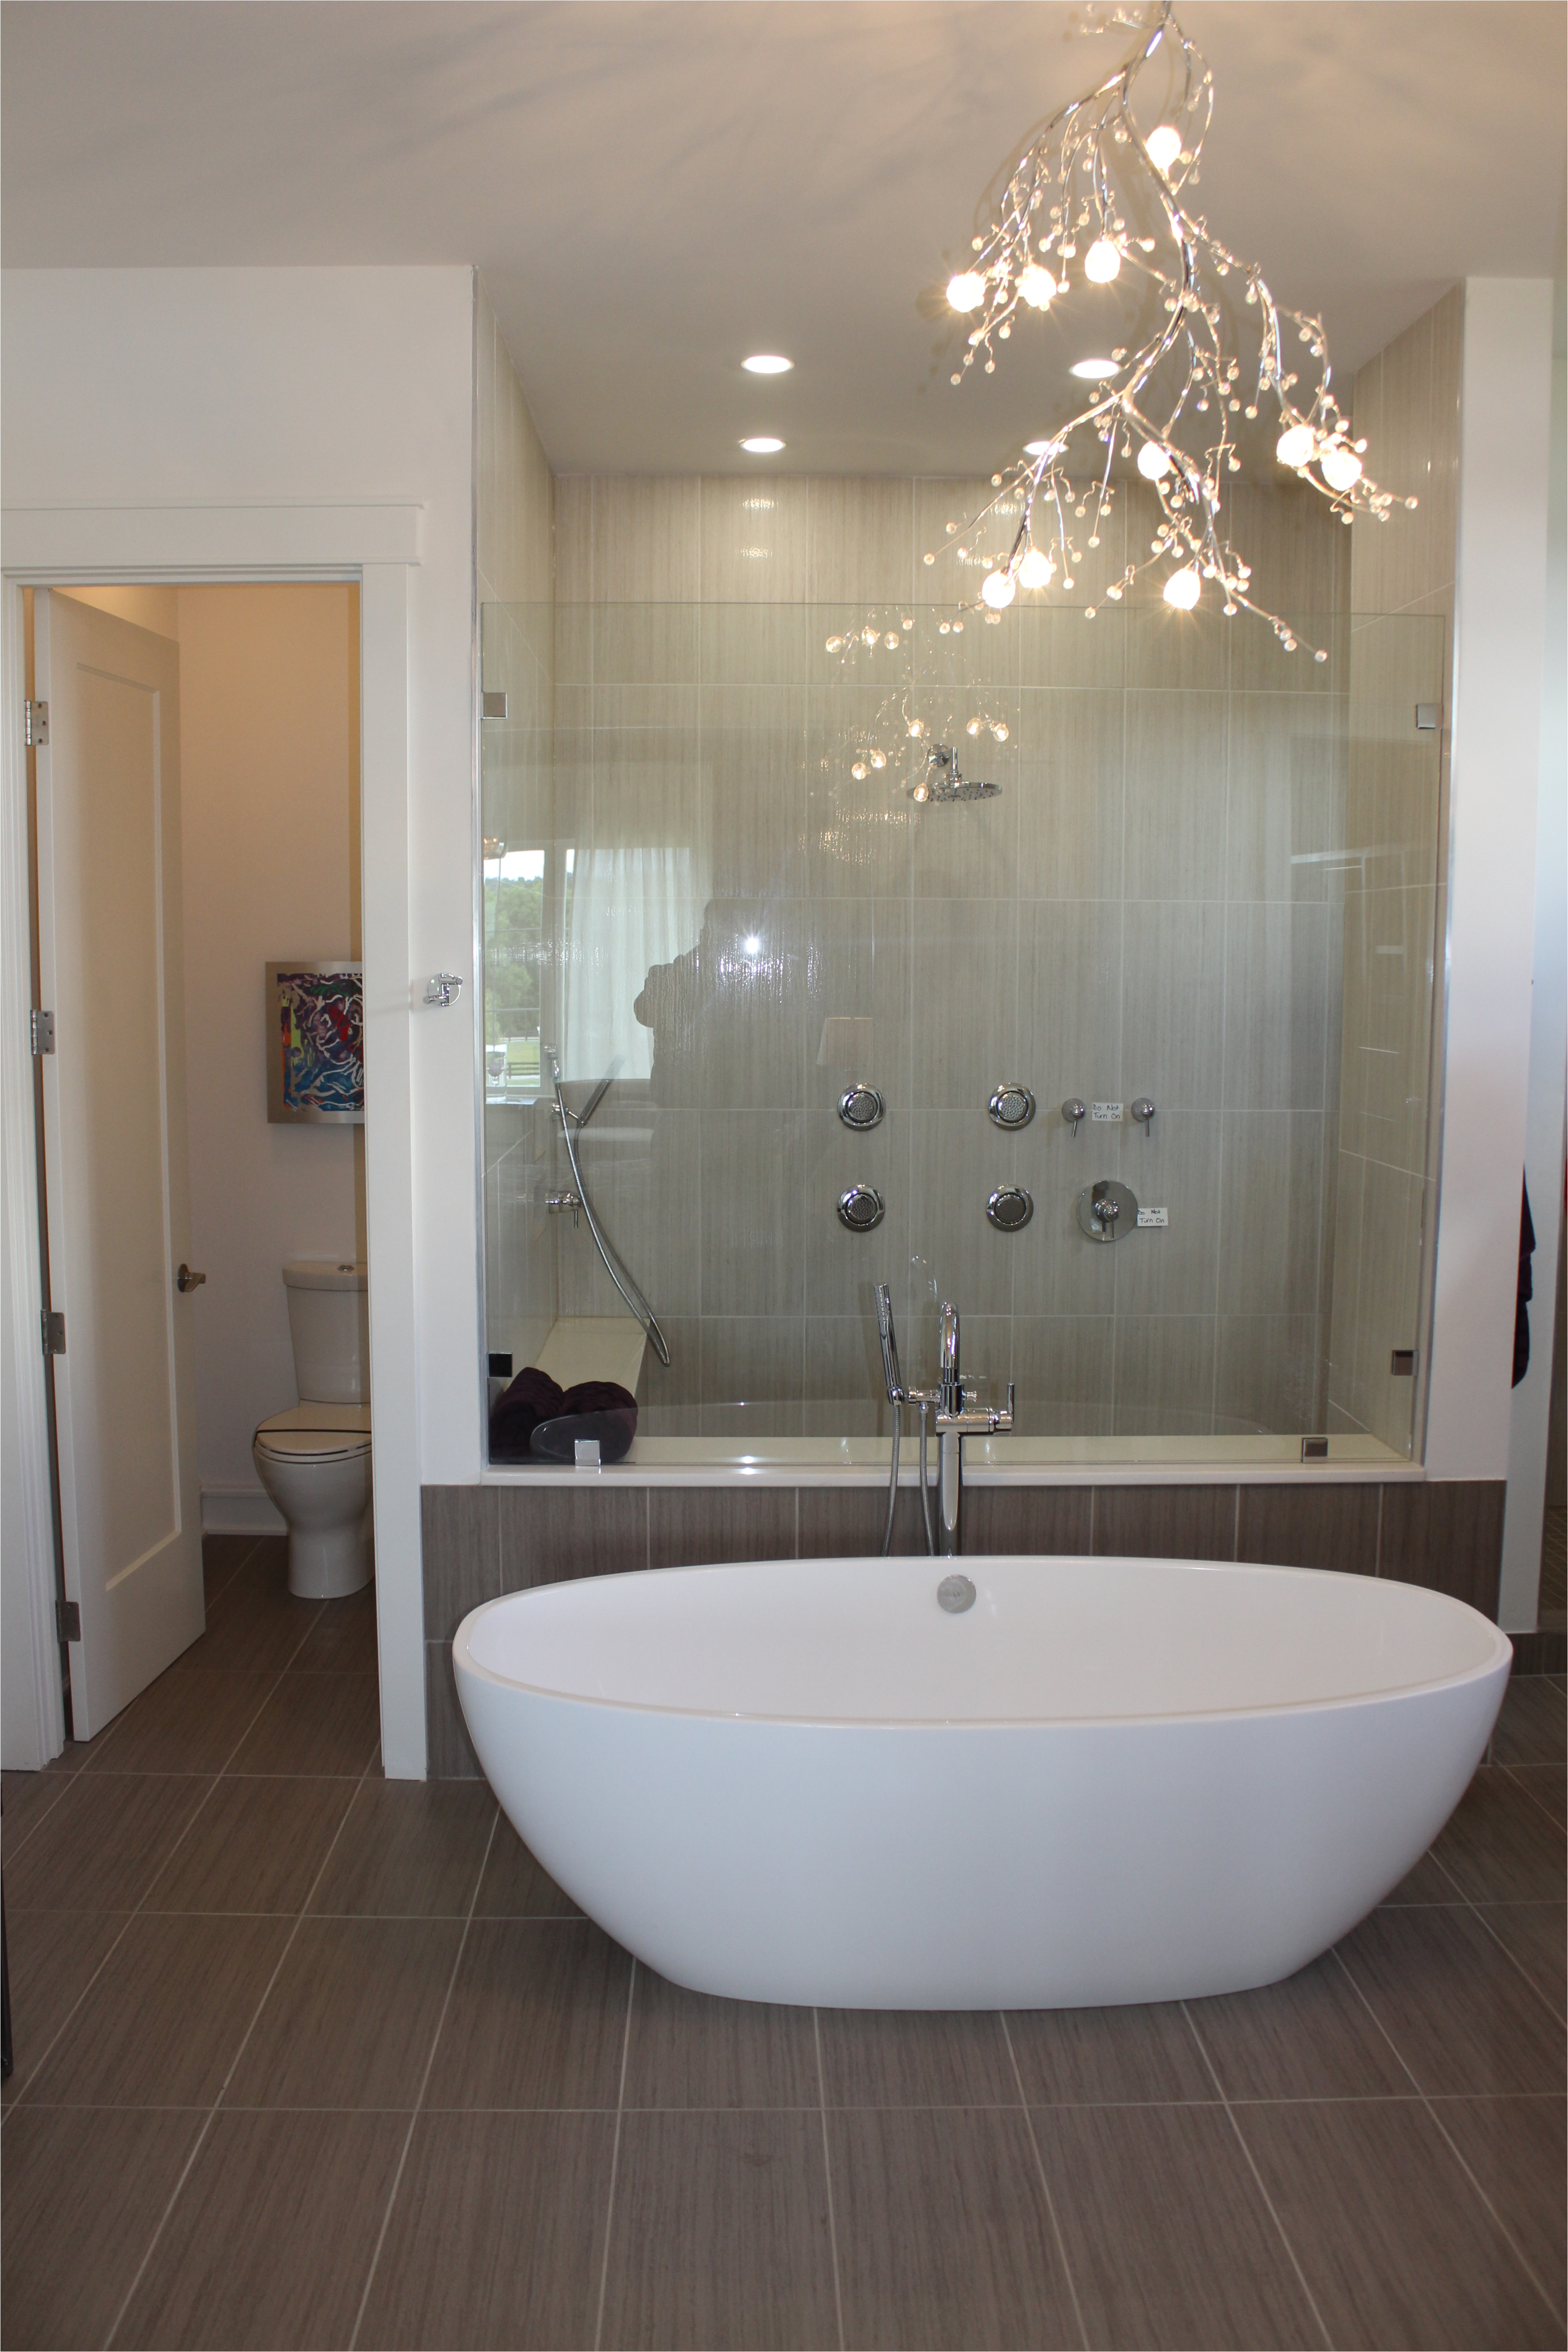 Basement Bathroom Designs Unique Basement Bathroom Design Ideas Bathroom Remodeling In Mansfield Oh